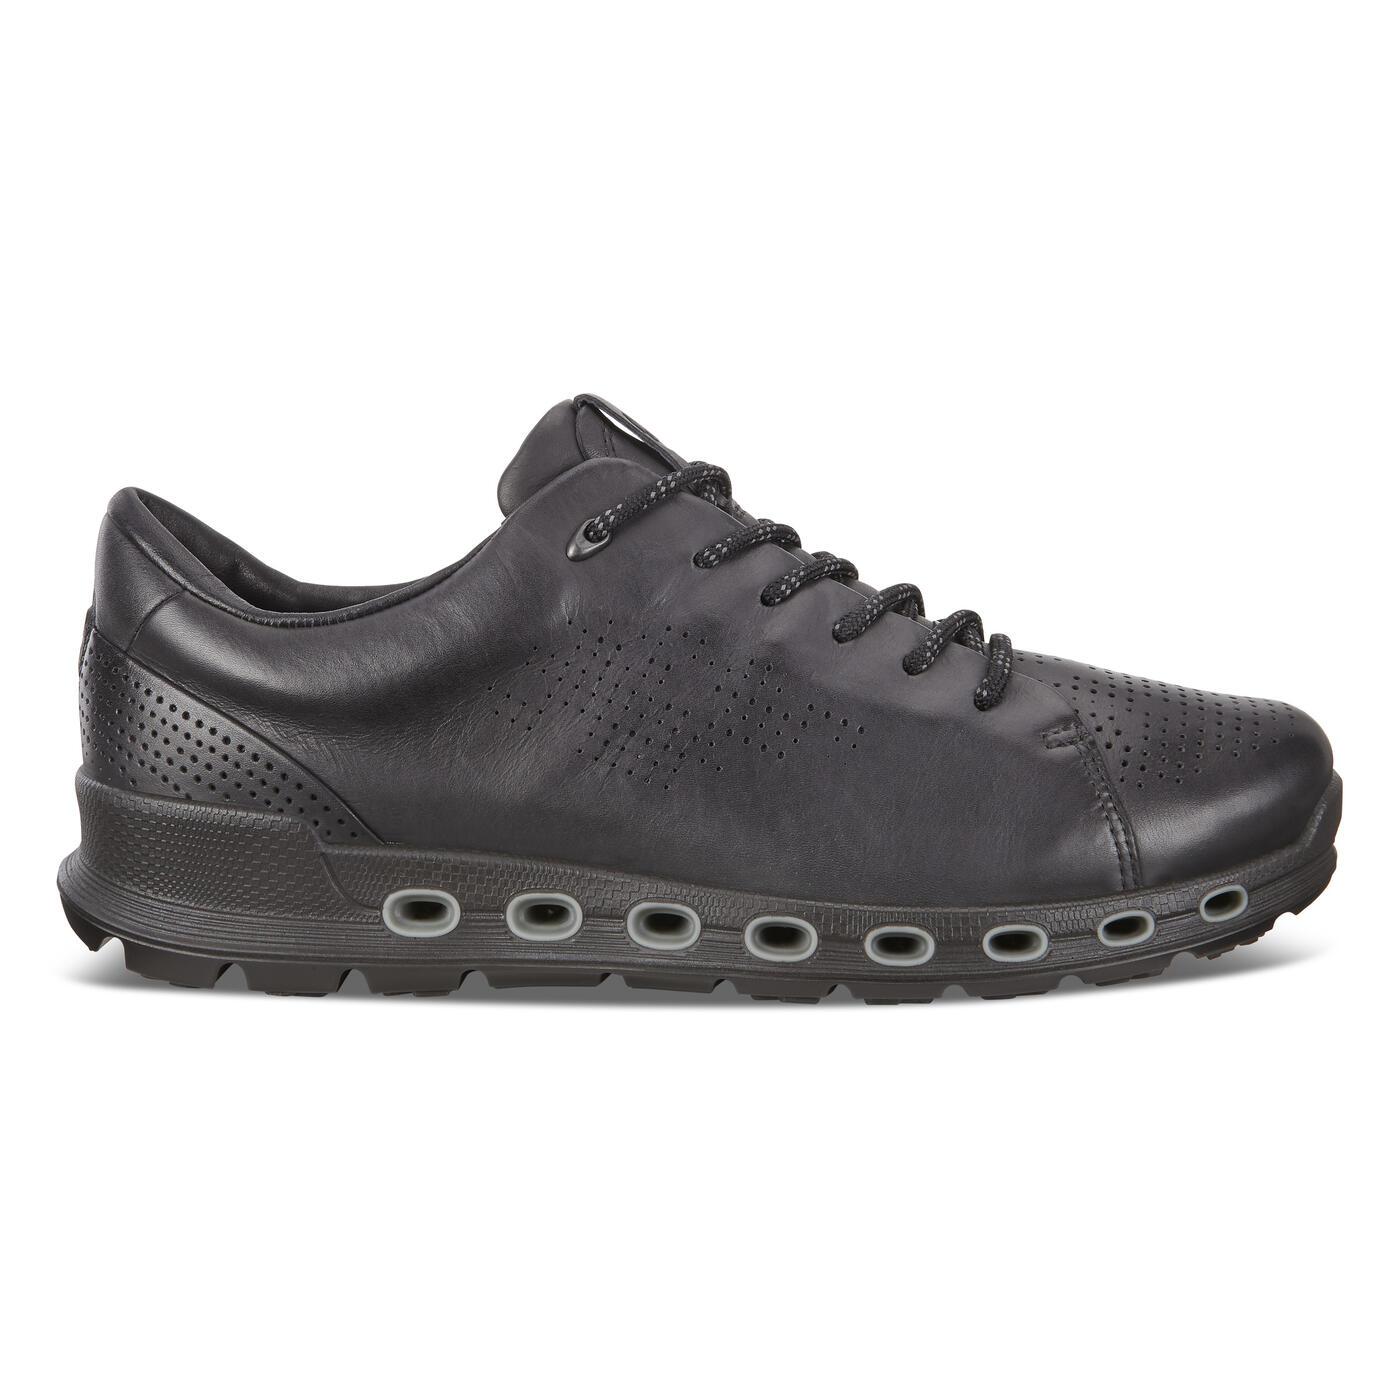 ECCO COOL 2.0 MEN'S Sneaker GTX